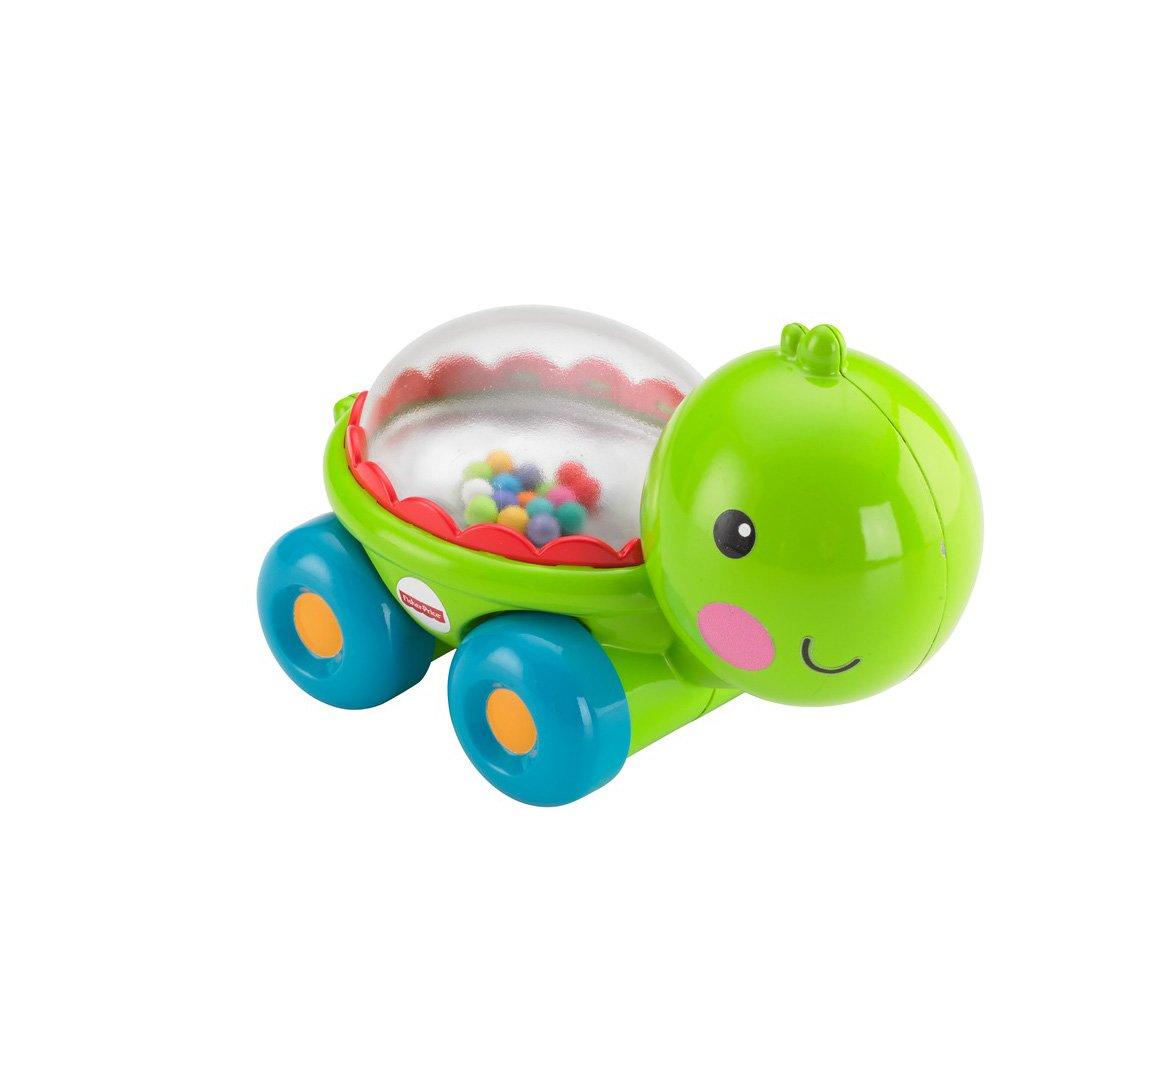 Fisher Price Tortuguita bolitas saltarinas Mattel BGX surtido: modelos colores aleatorios